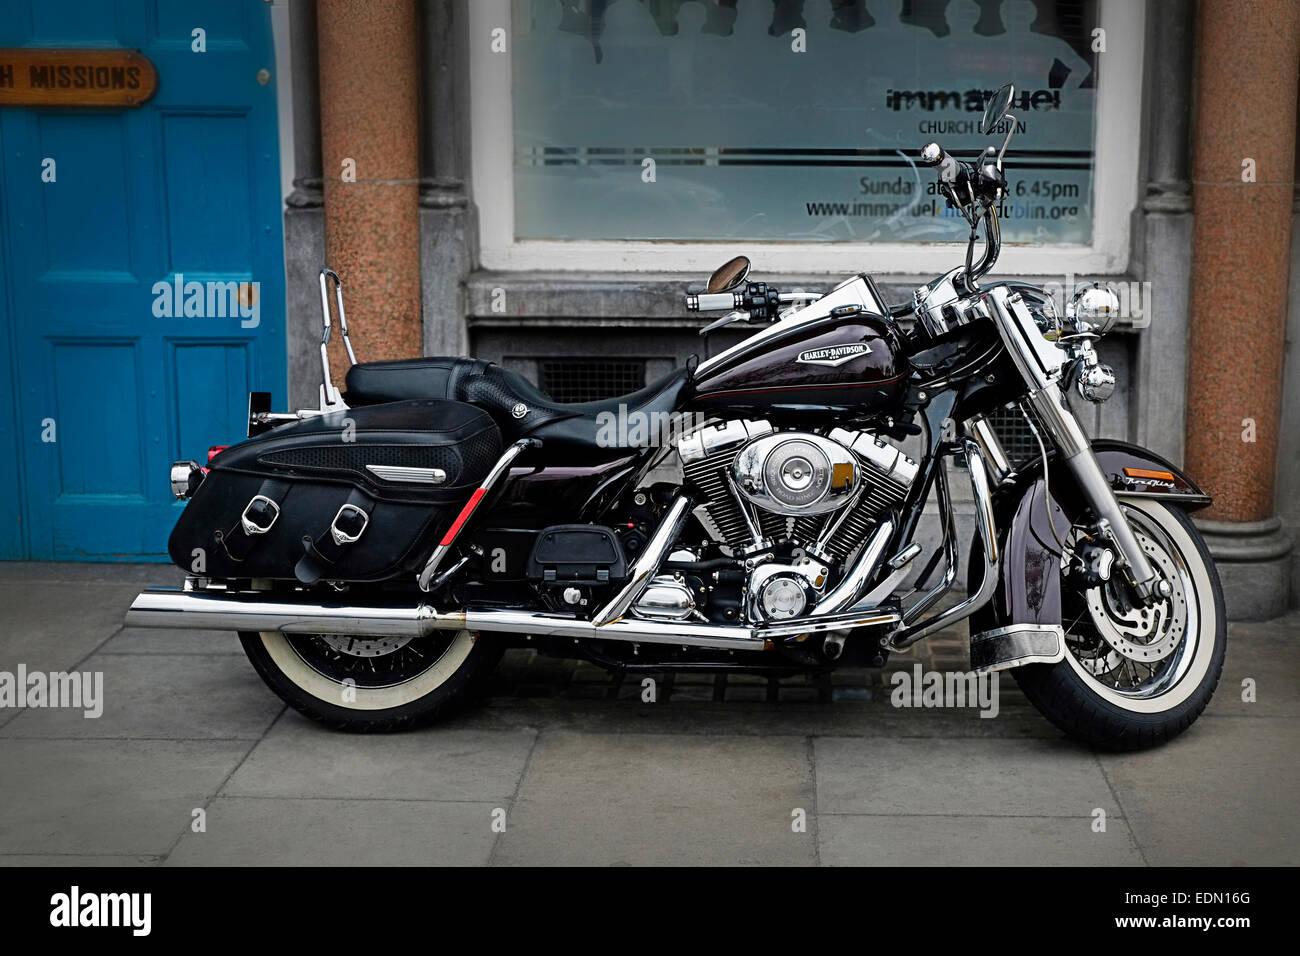 harley davidson road king motorcycle black and chrome dublin